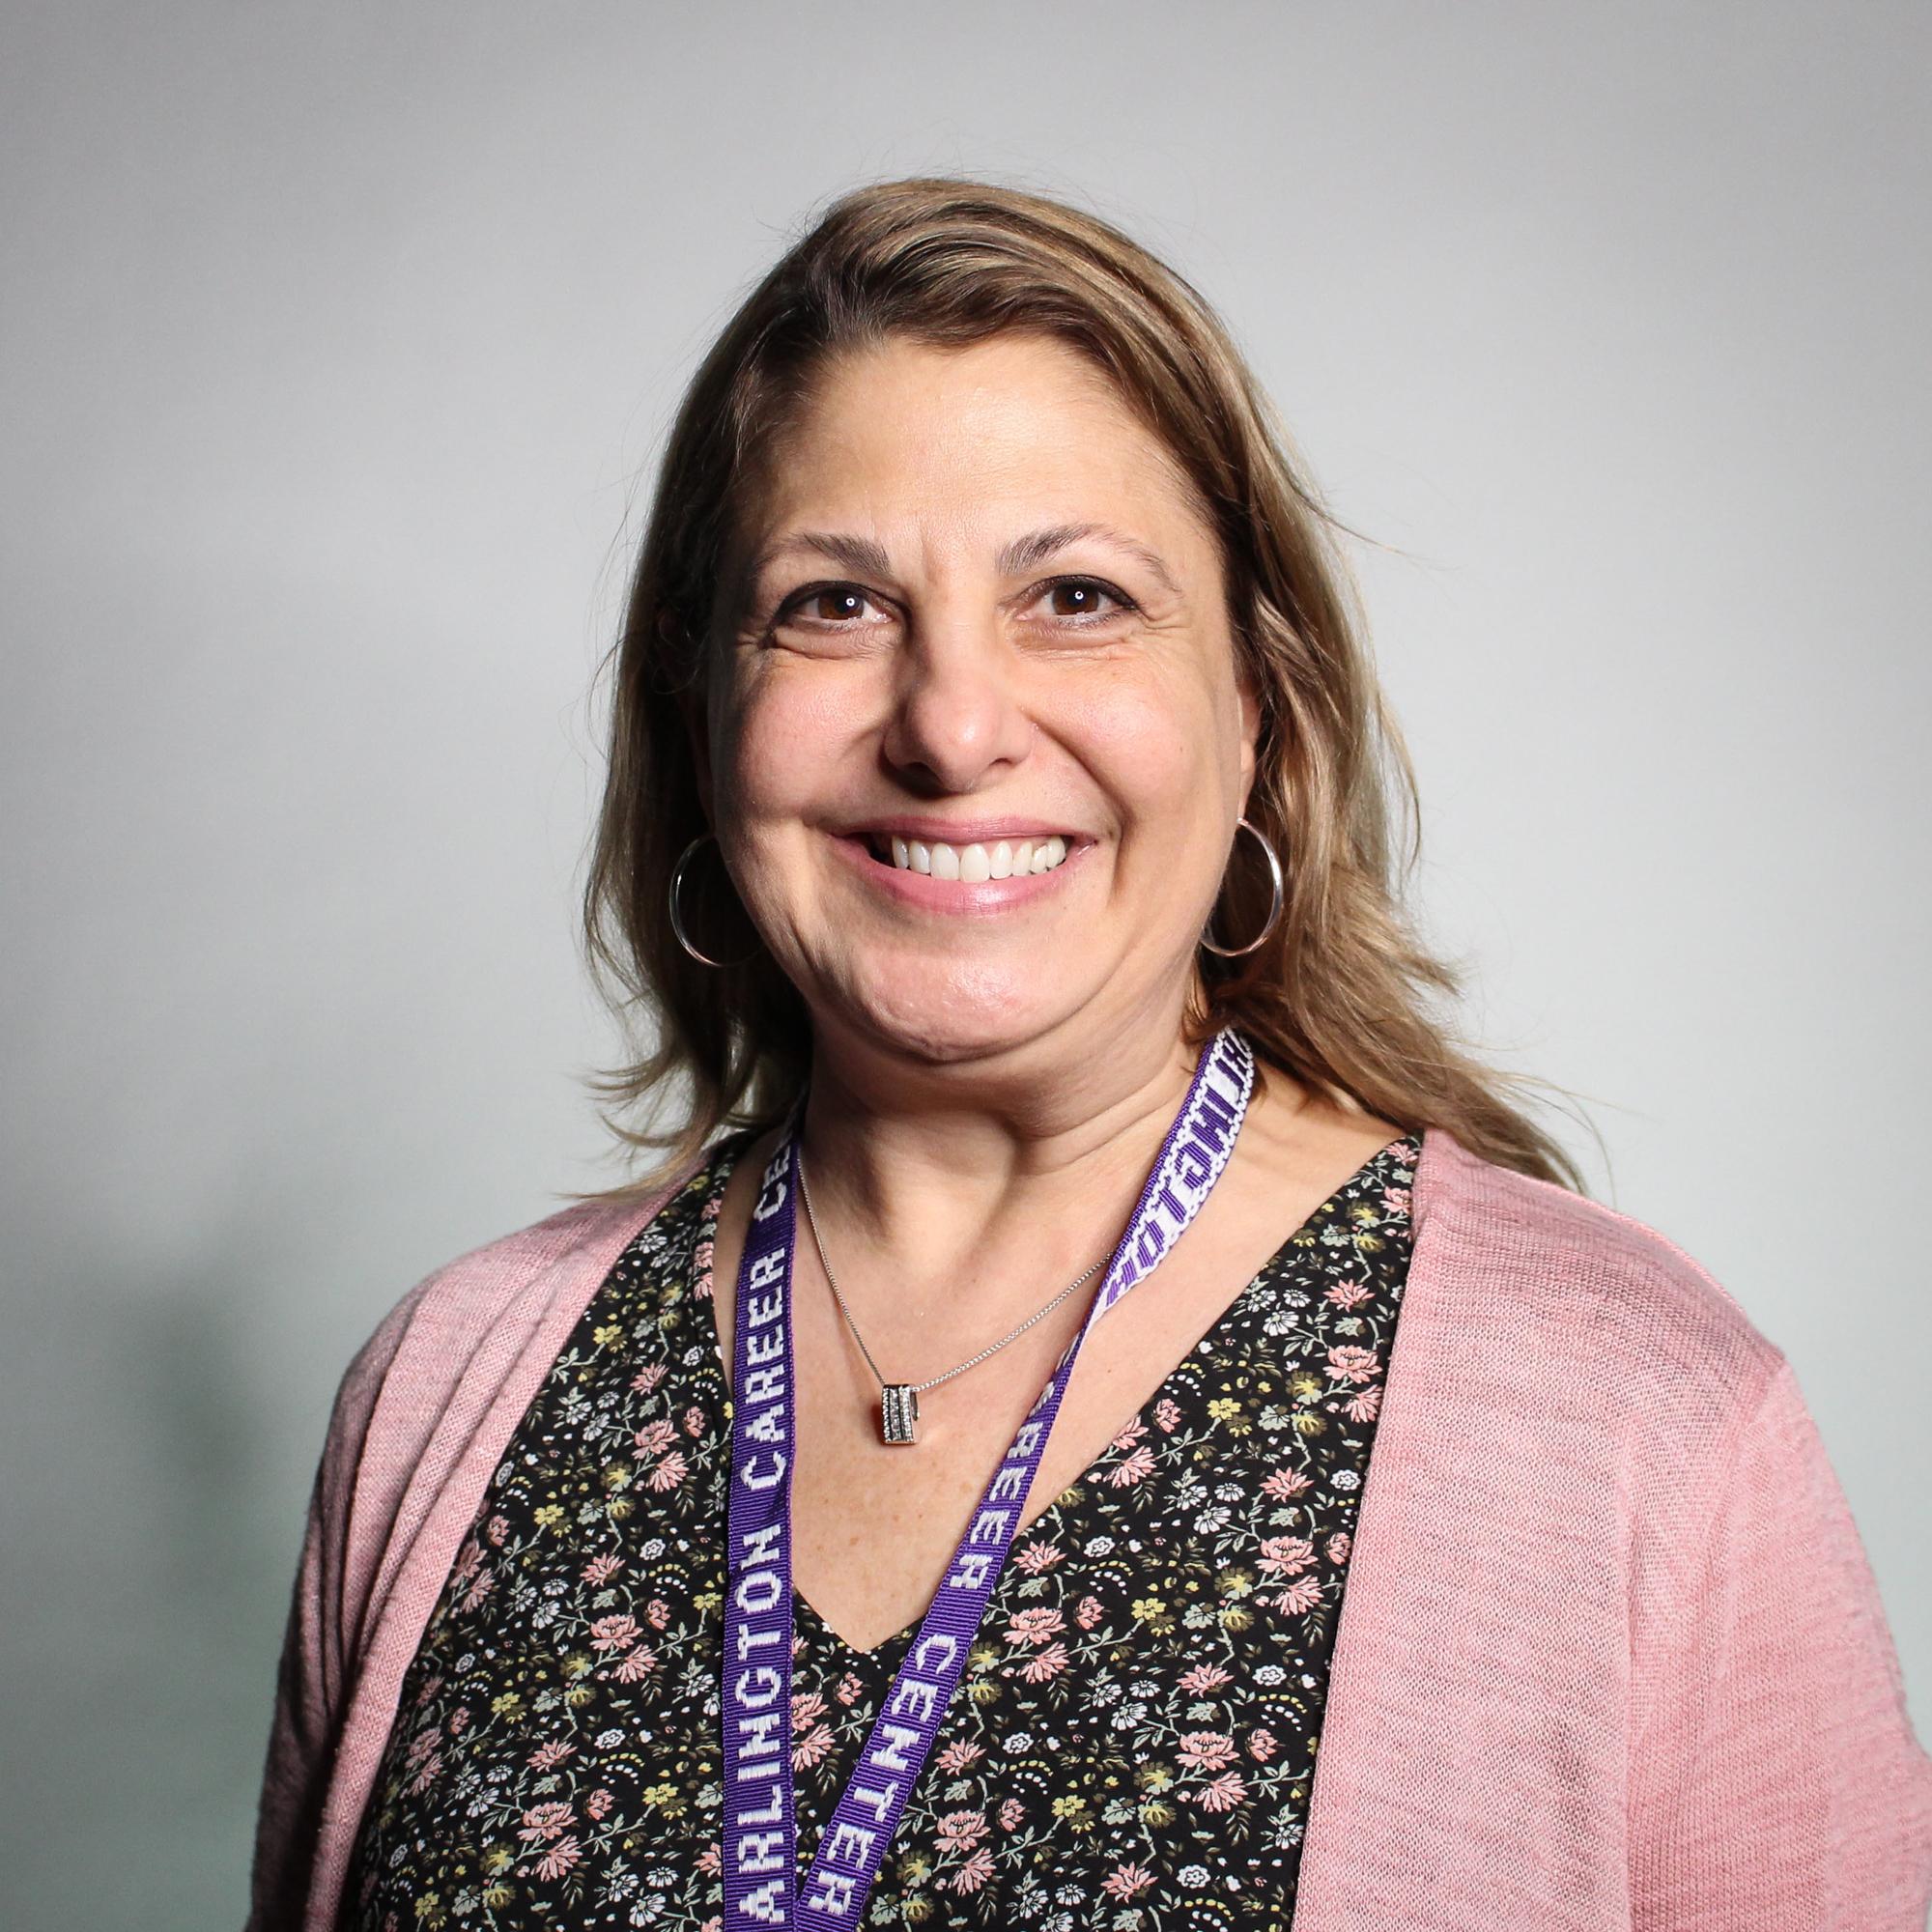 Ms. Jackie Livelli